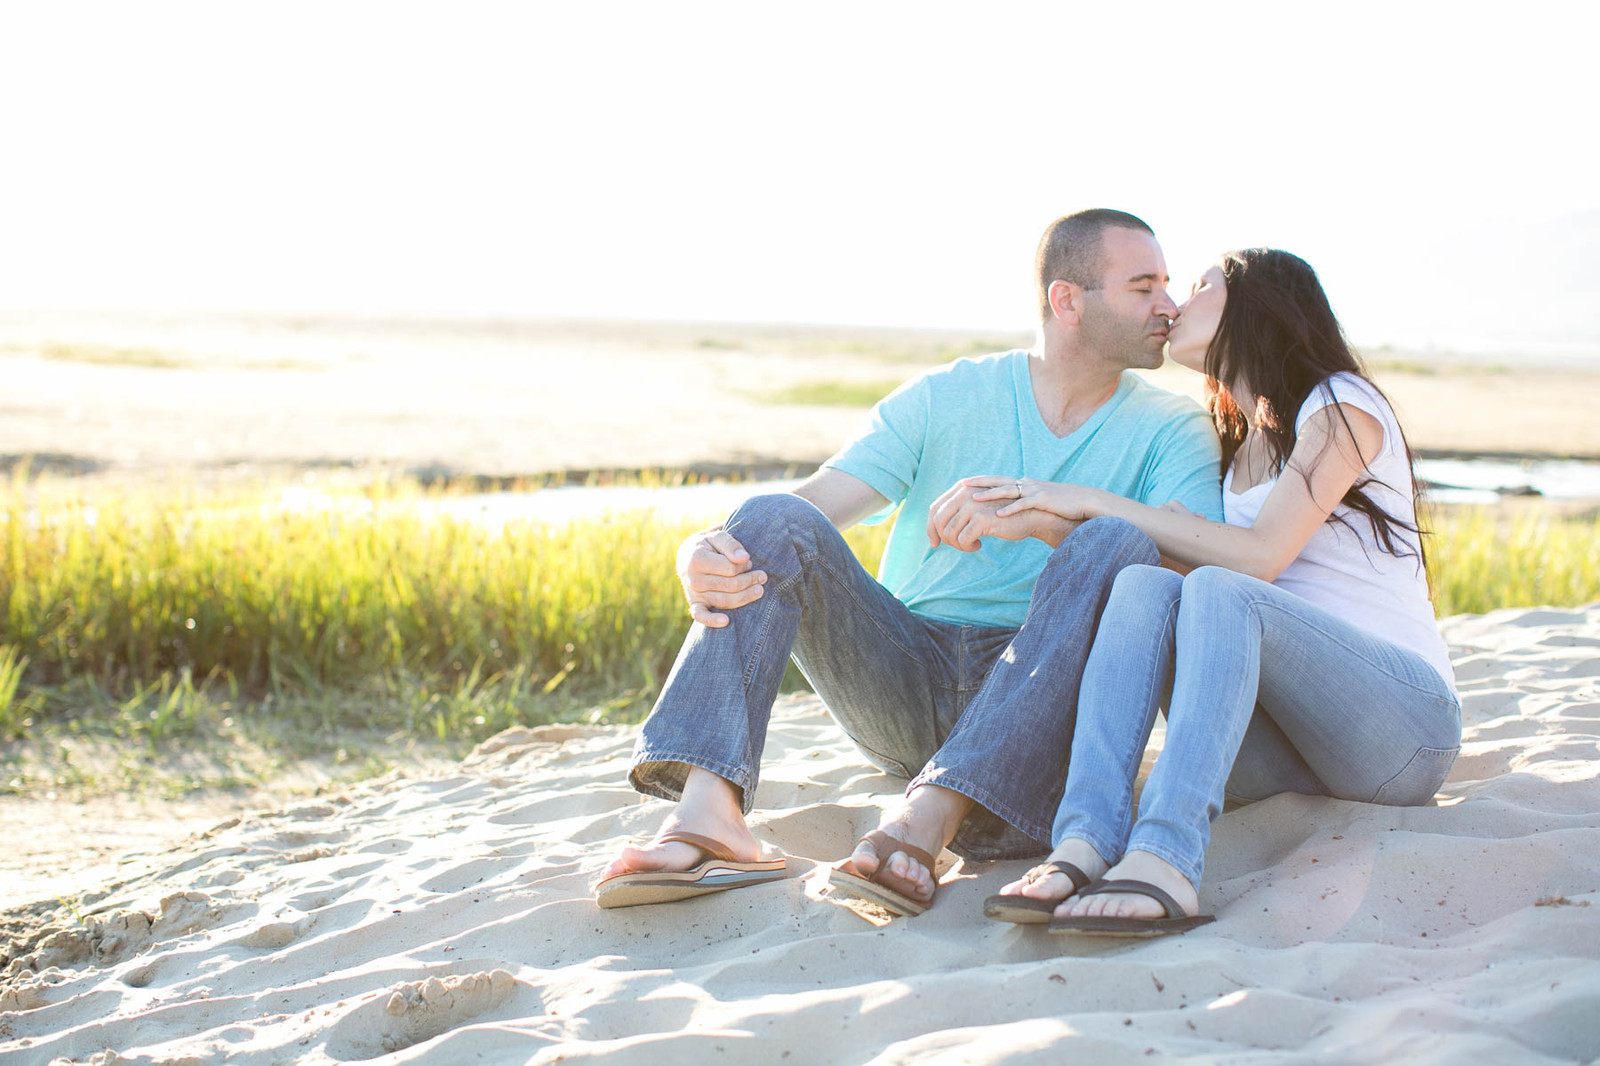 Avio liitto ei dating 12